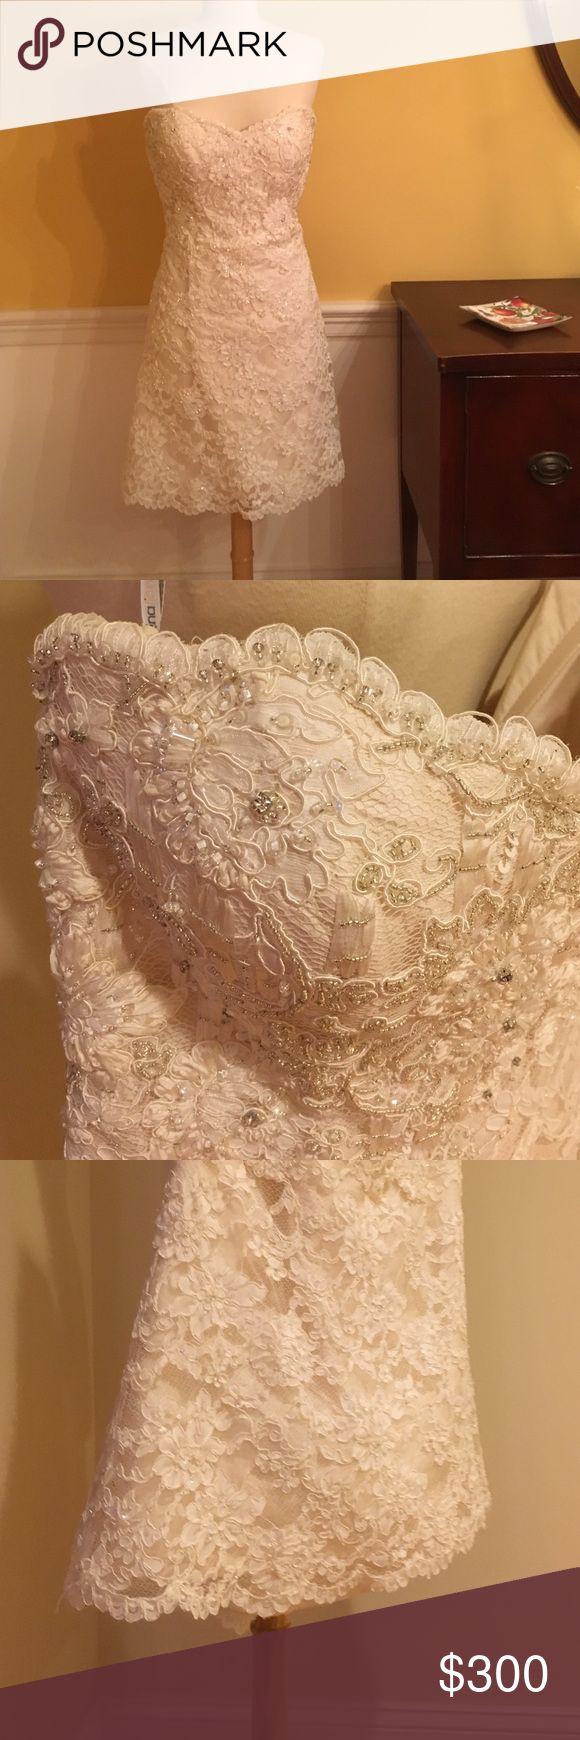 Martina Liana Wedding Dress Australian designer dress with stunning beadwork, Sweetheart neck line - Dress is lined in 100% silk martina liana Dresses Wedding